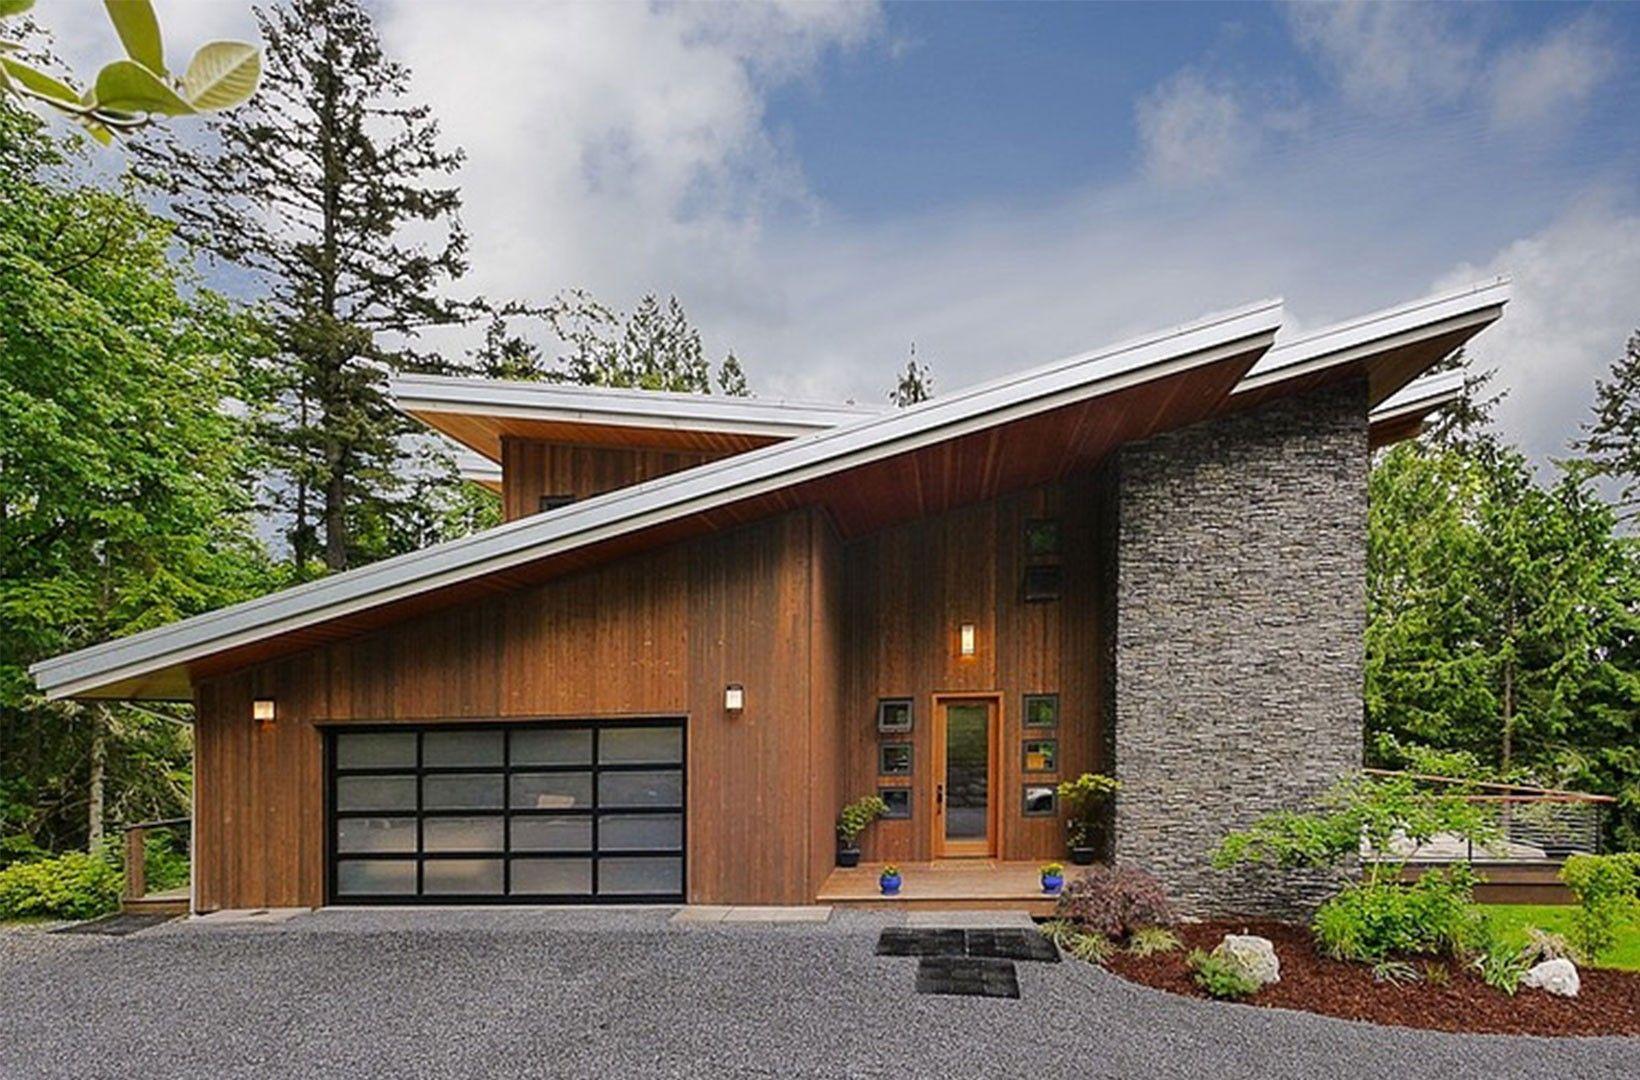 Single Slope Roof House Plans Elegant High Pitched Roof House Plans Elegant Modern Cabin Design Modern Modern Cottage Facade House House Exterior